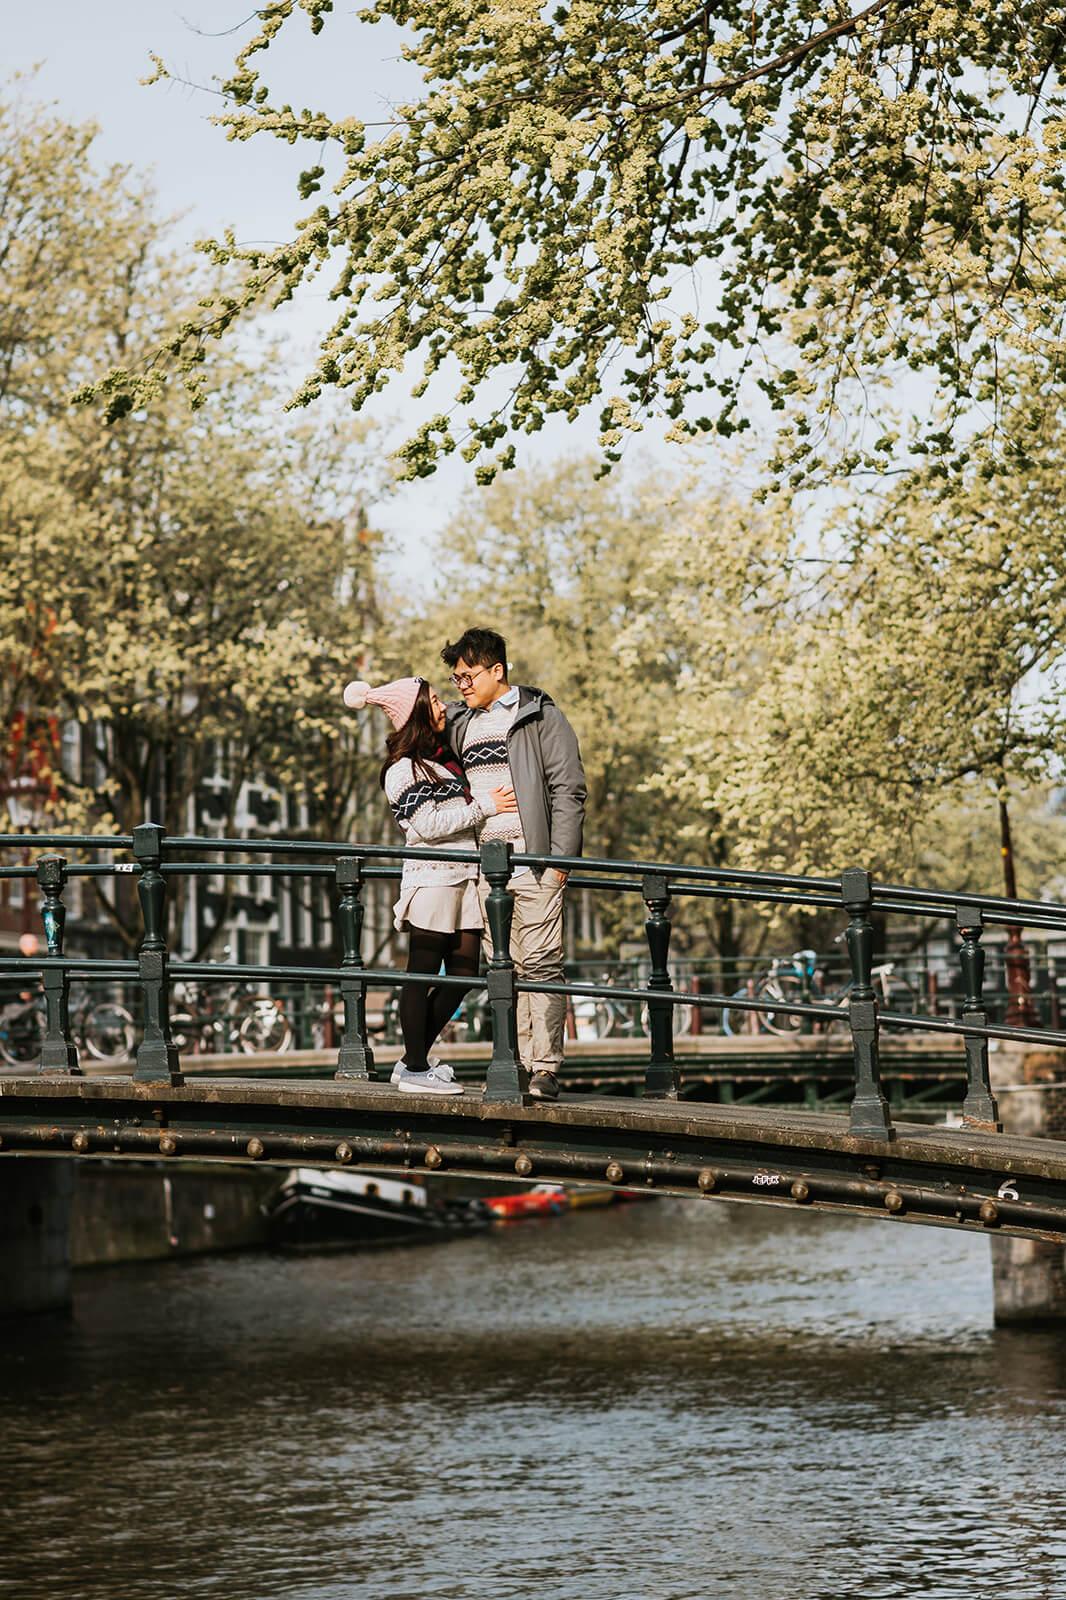 consuelo-engagement-photographer-amsterdam-netherlands-taylor-content.jpg